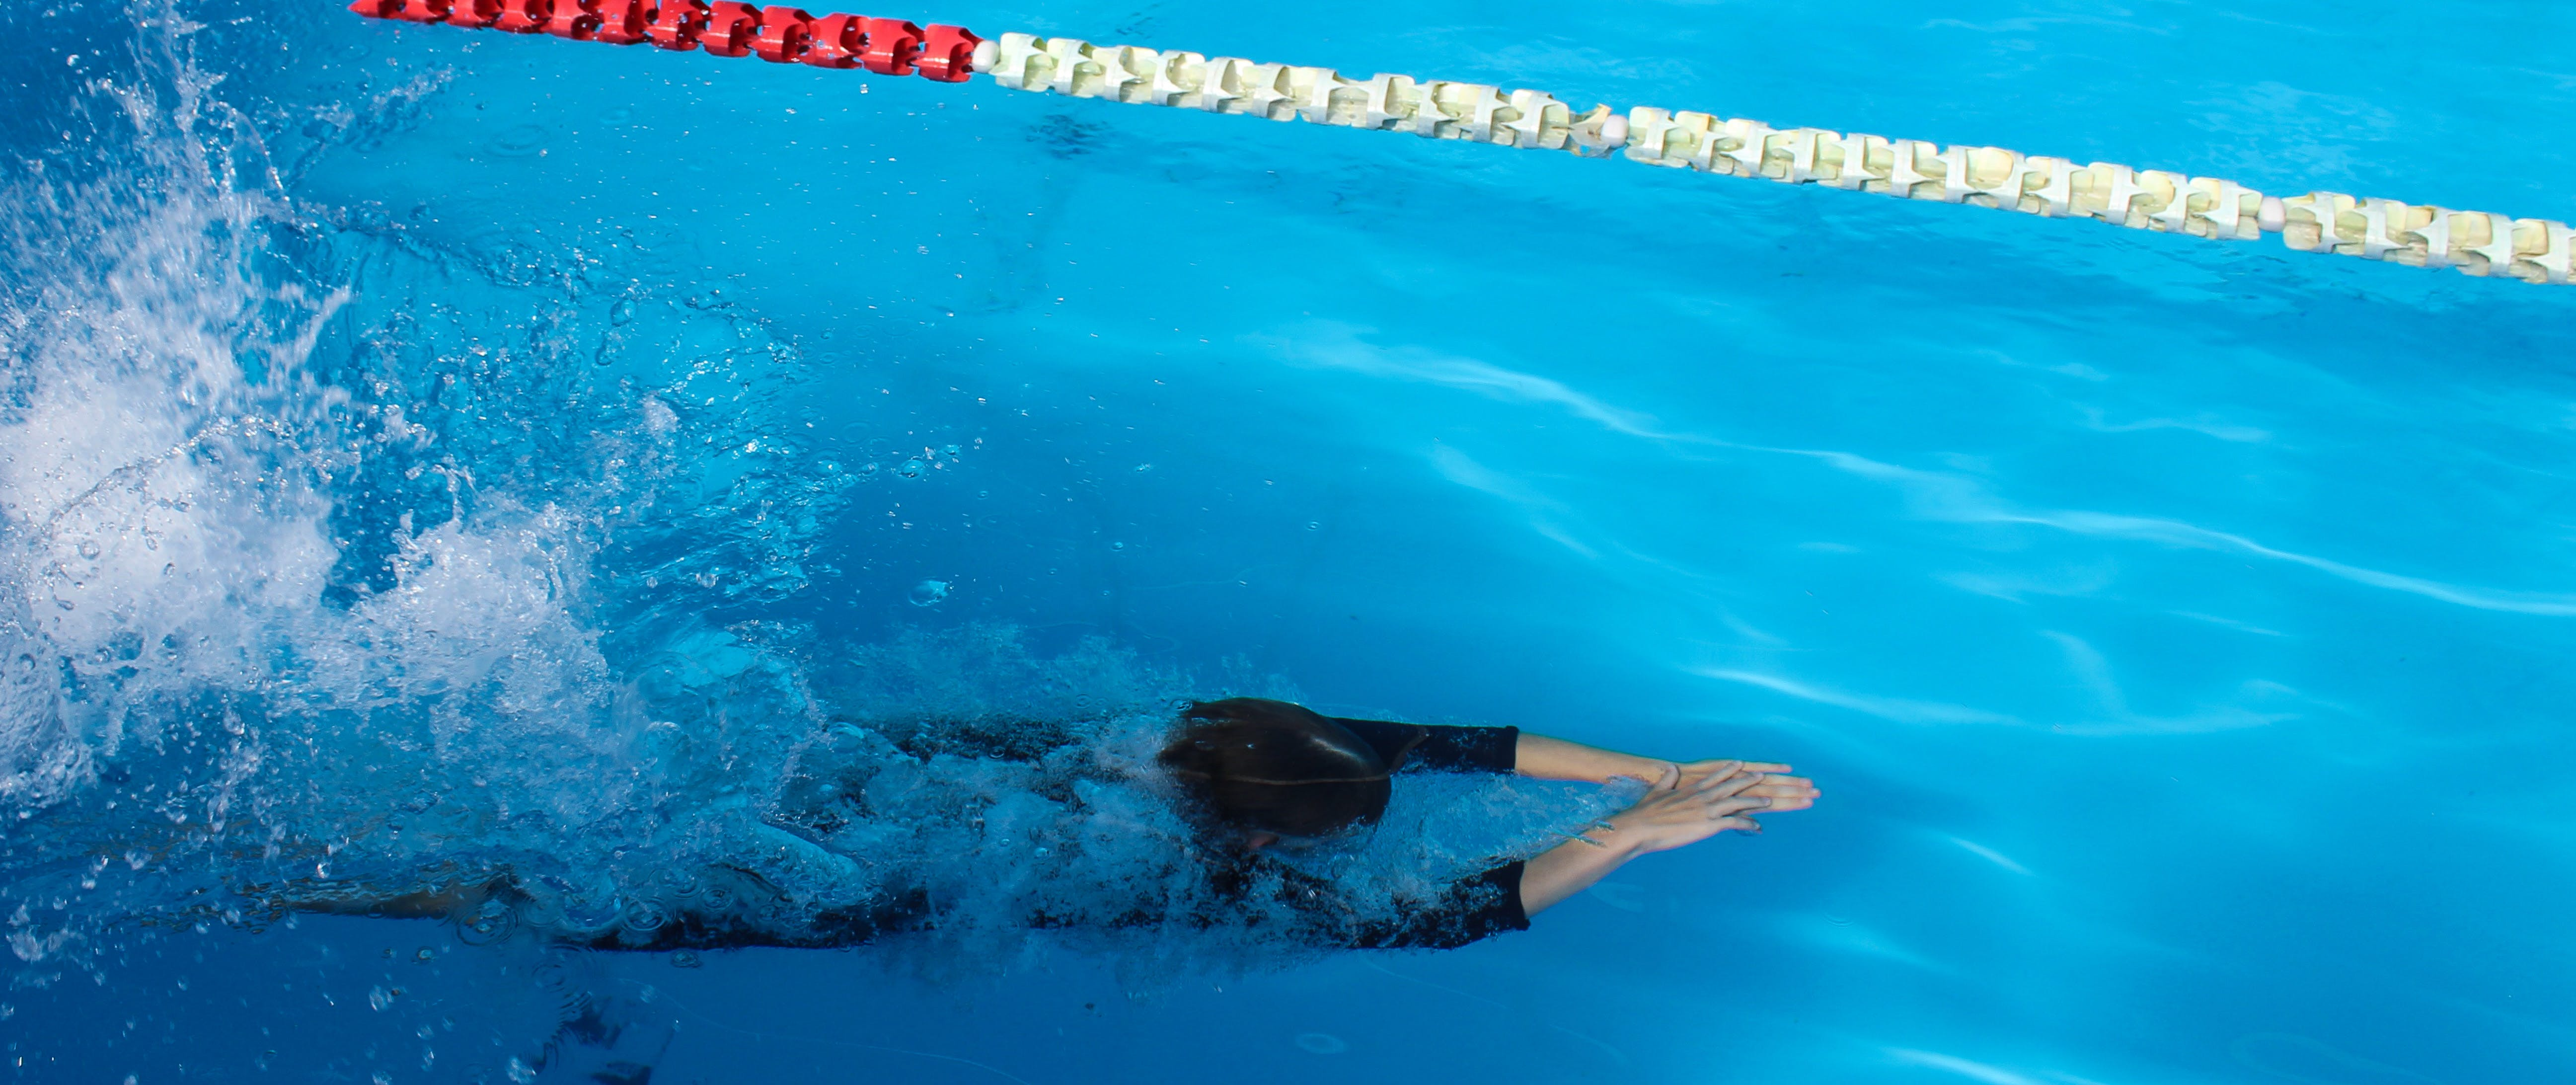 Free stock photo of #dive#water#swimmingpool